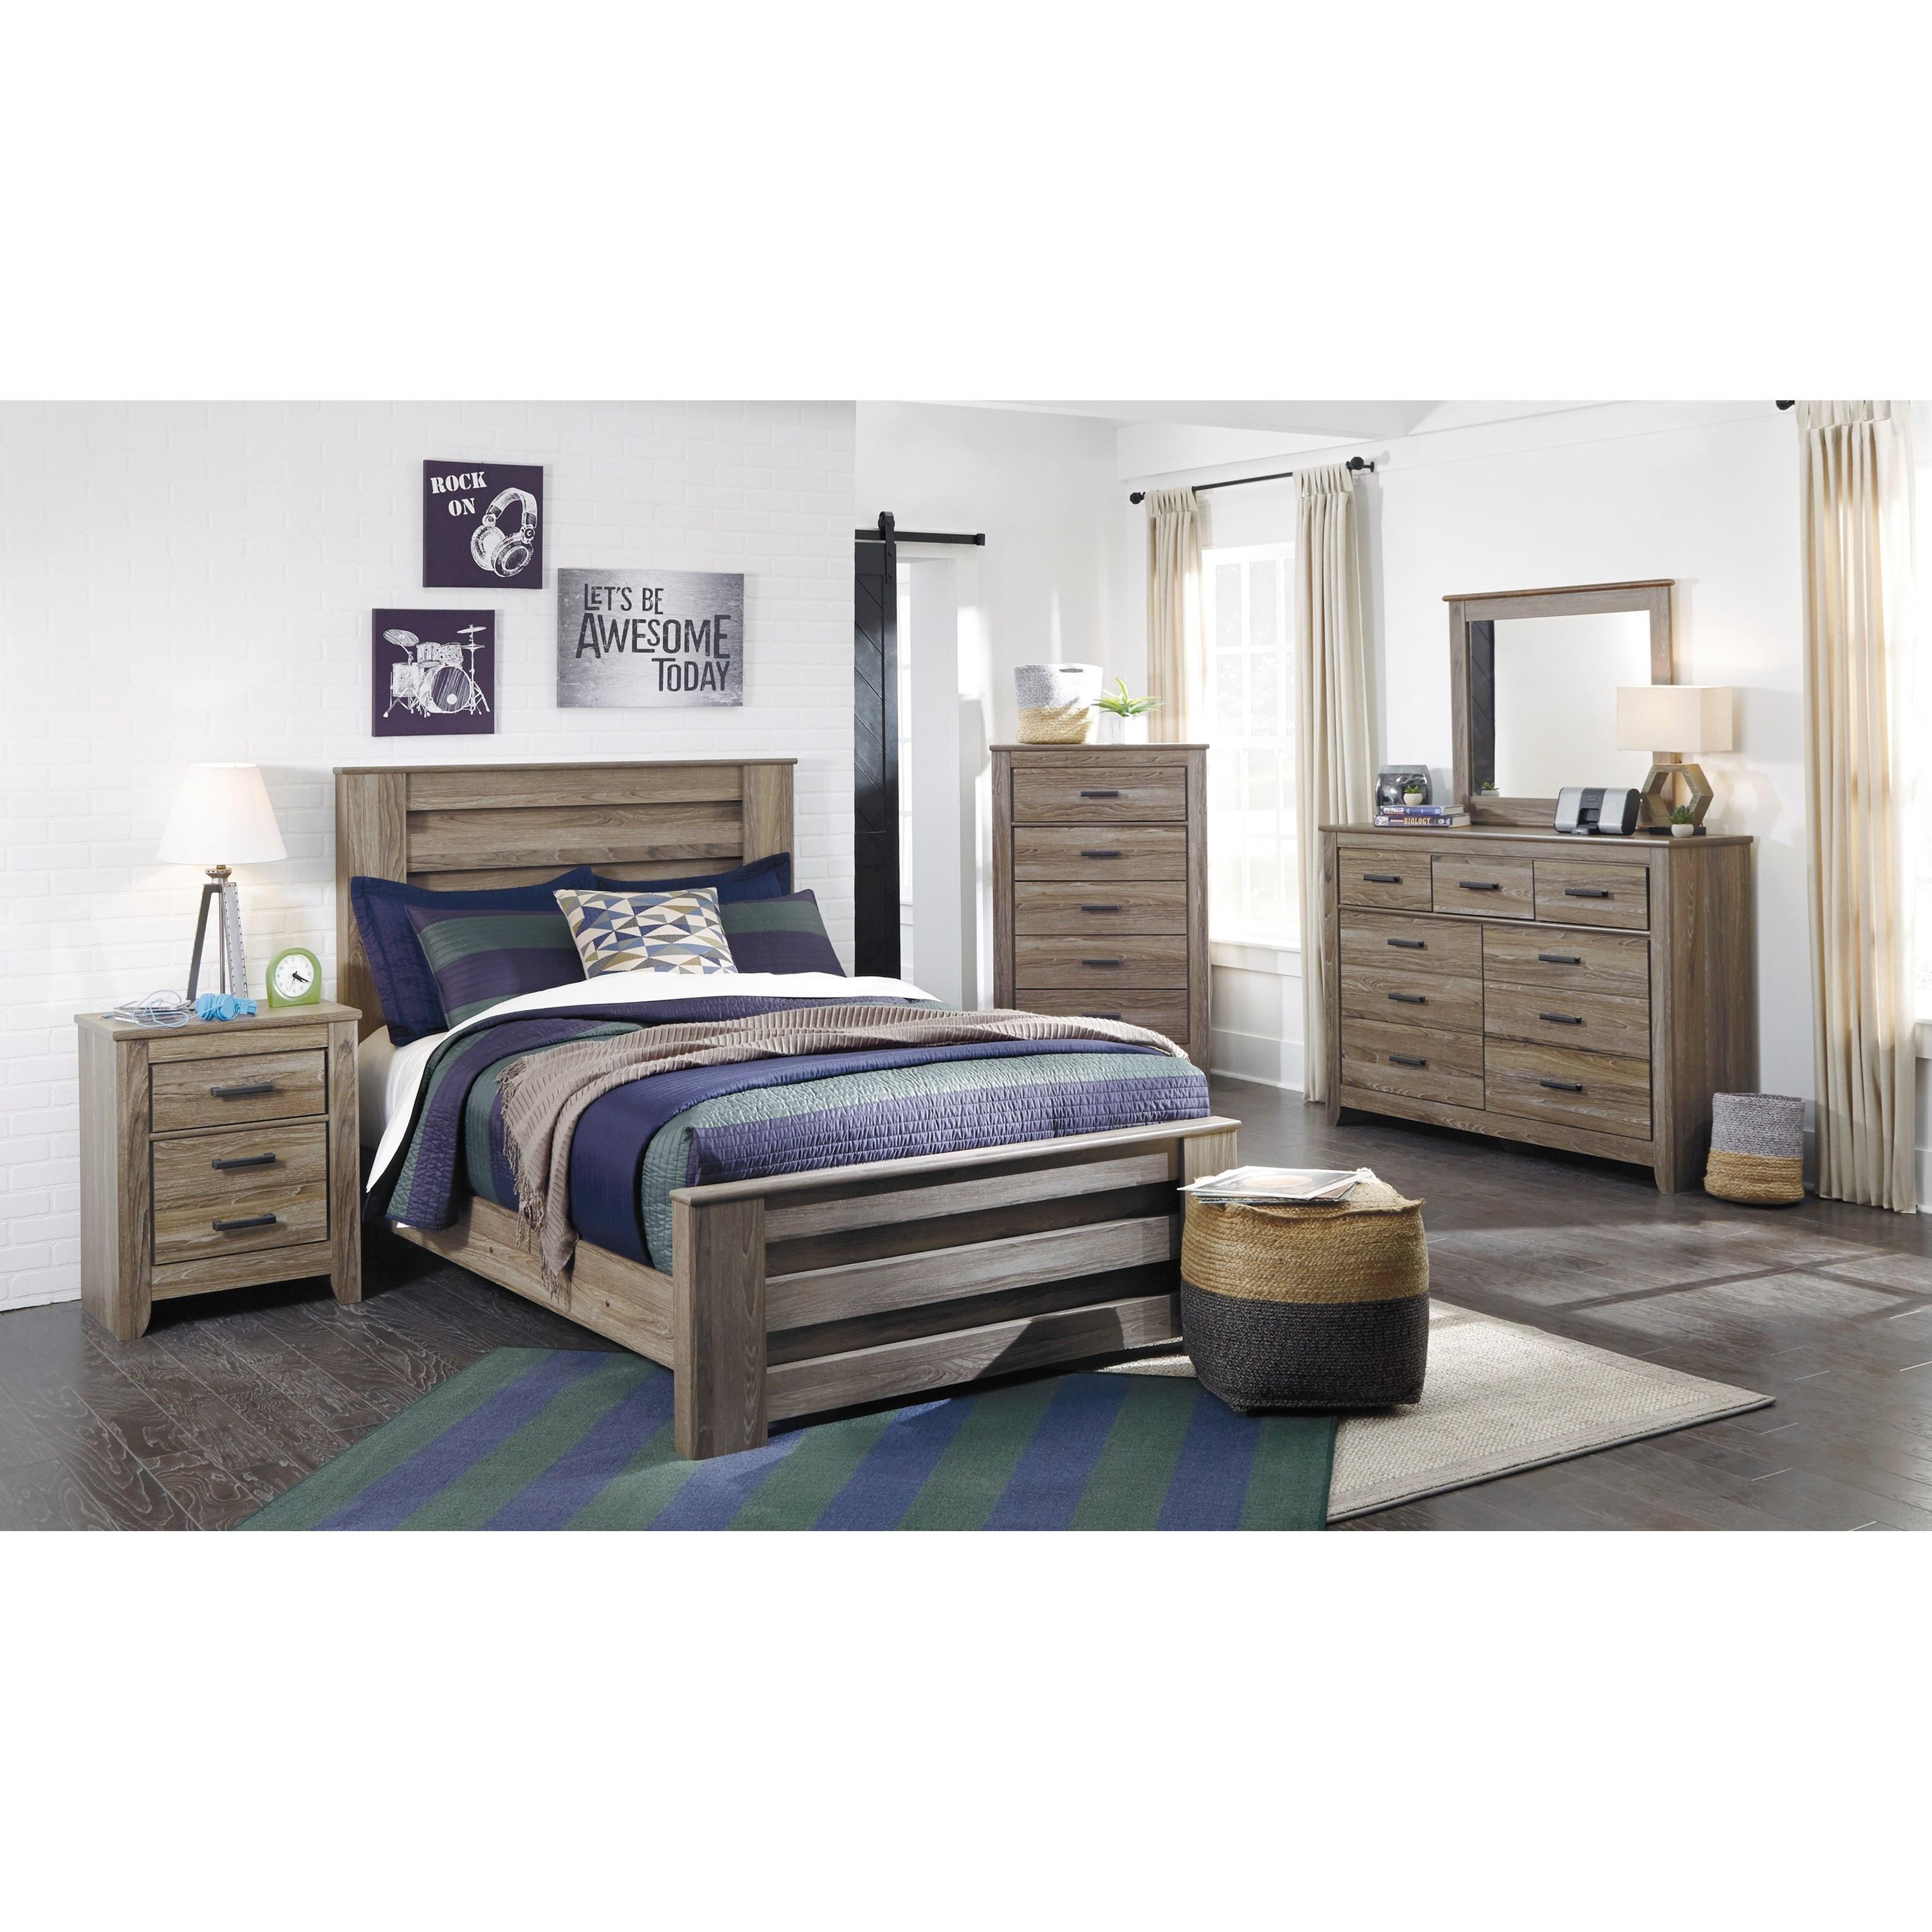 Ashley Furniture Superstore: Signature Design By Ashley Zelen Full Bedroom Group